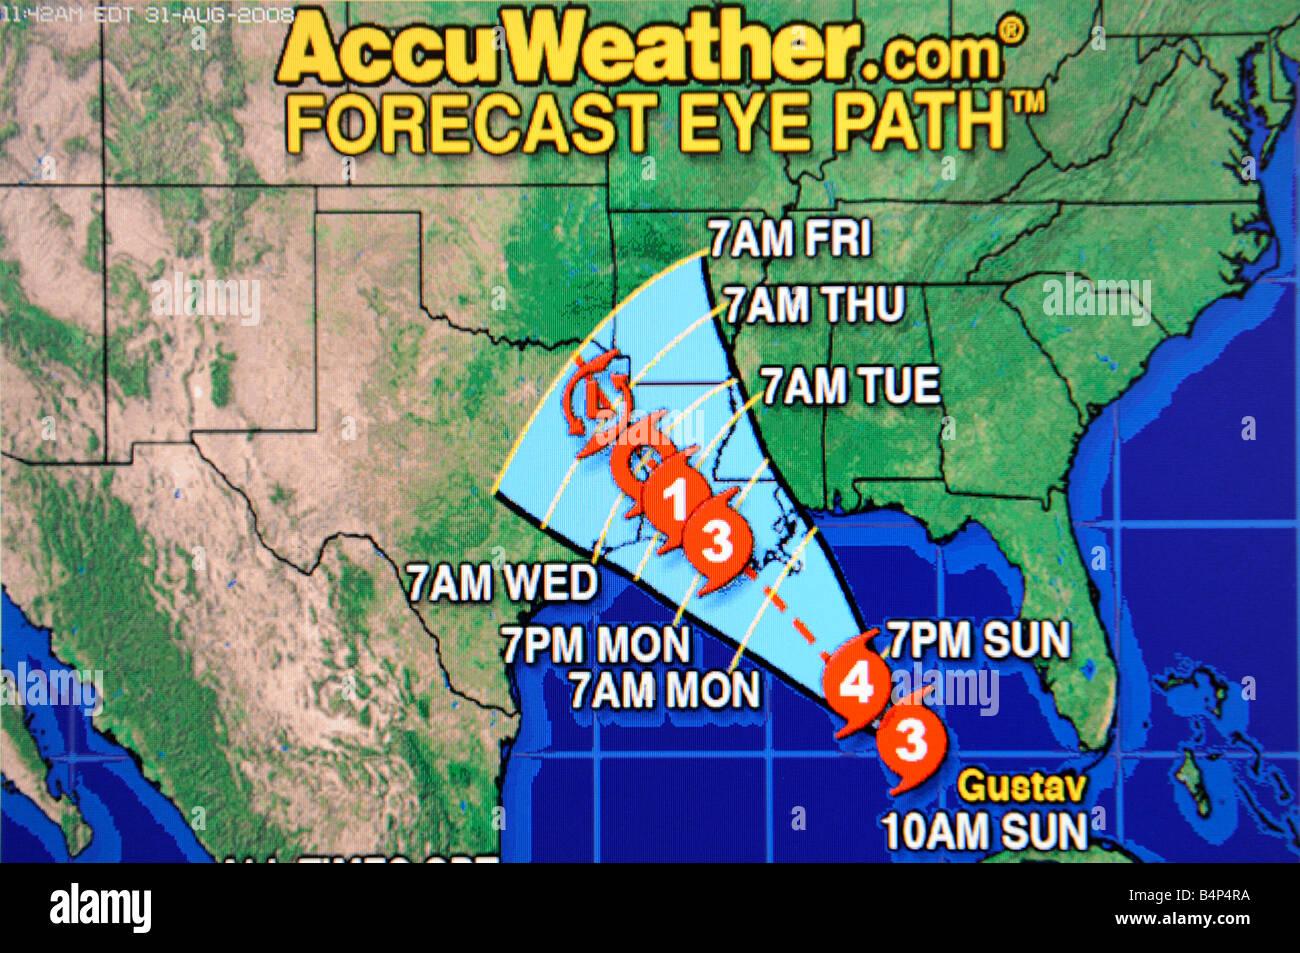 Hurricane Satellite Weather Map As Viewed On The Internet And On - Satellite weather map